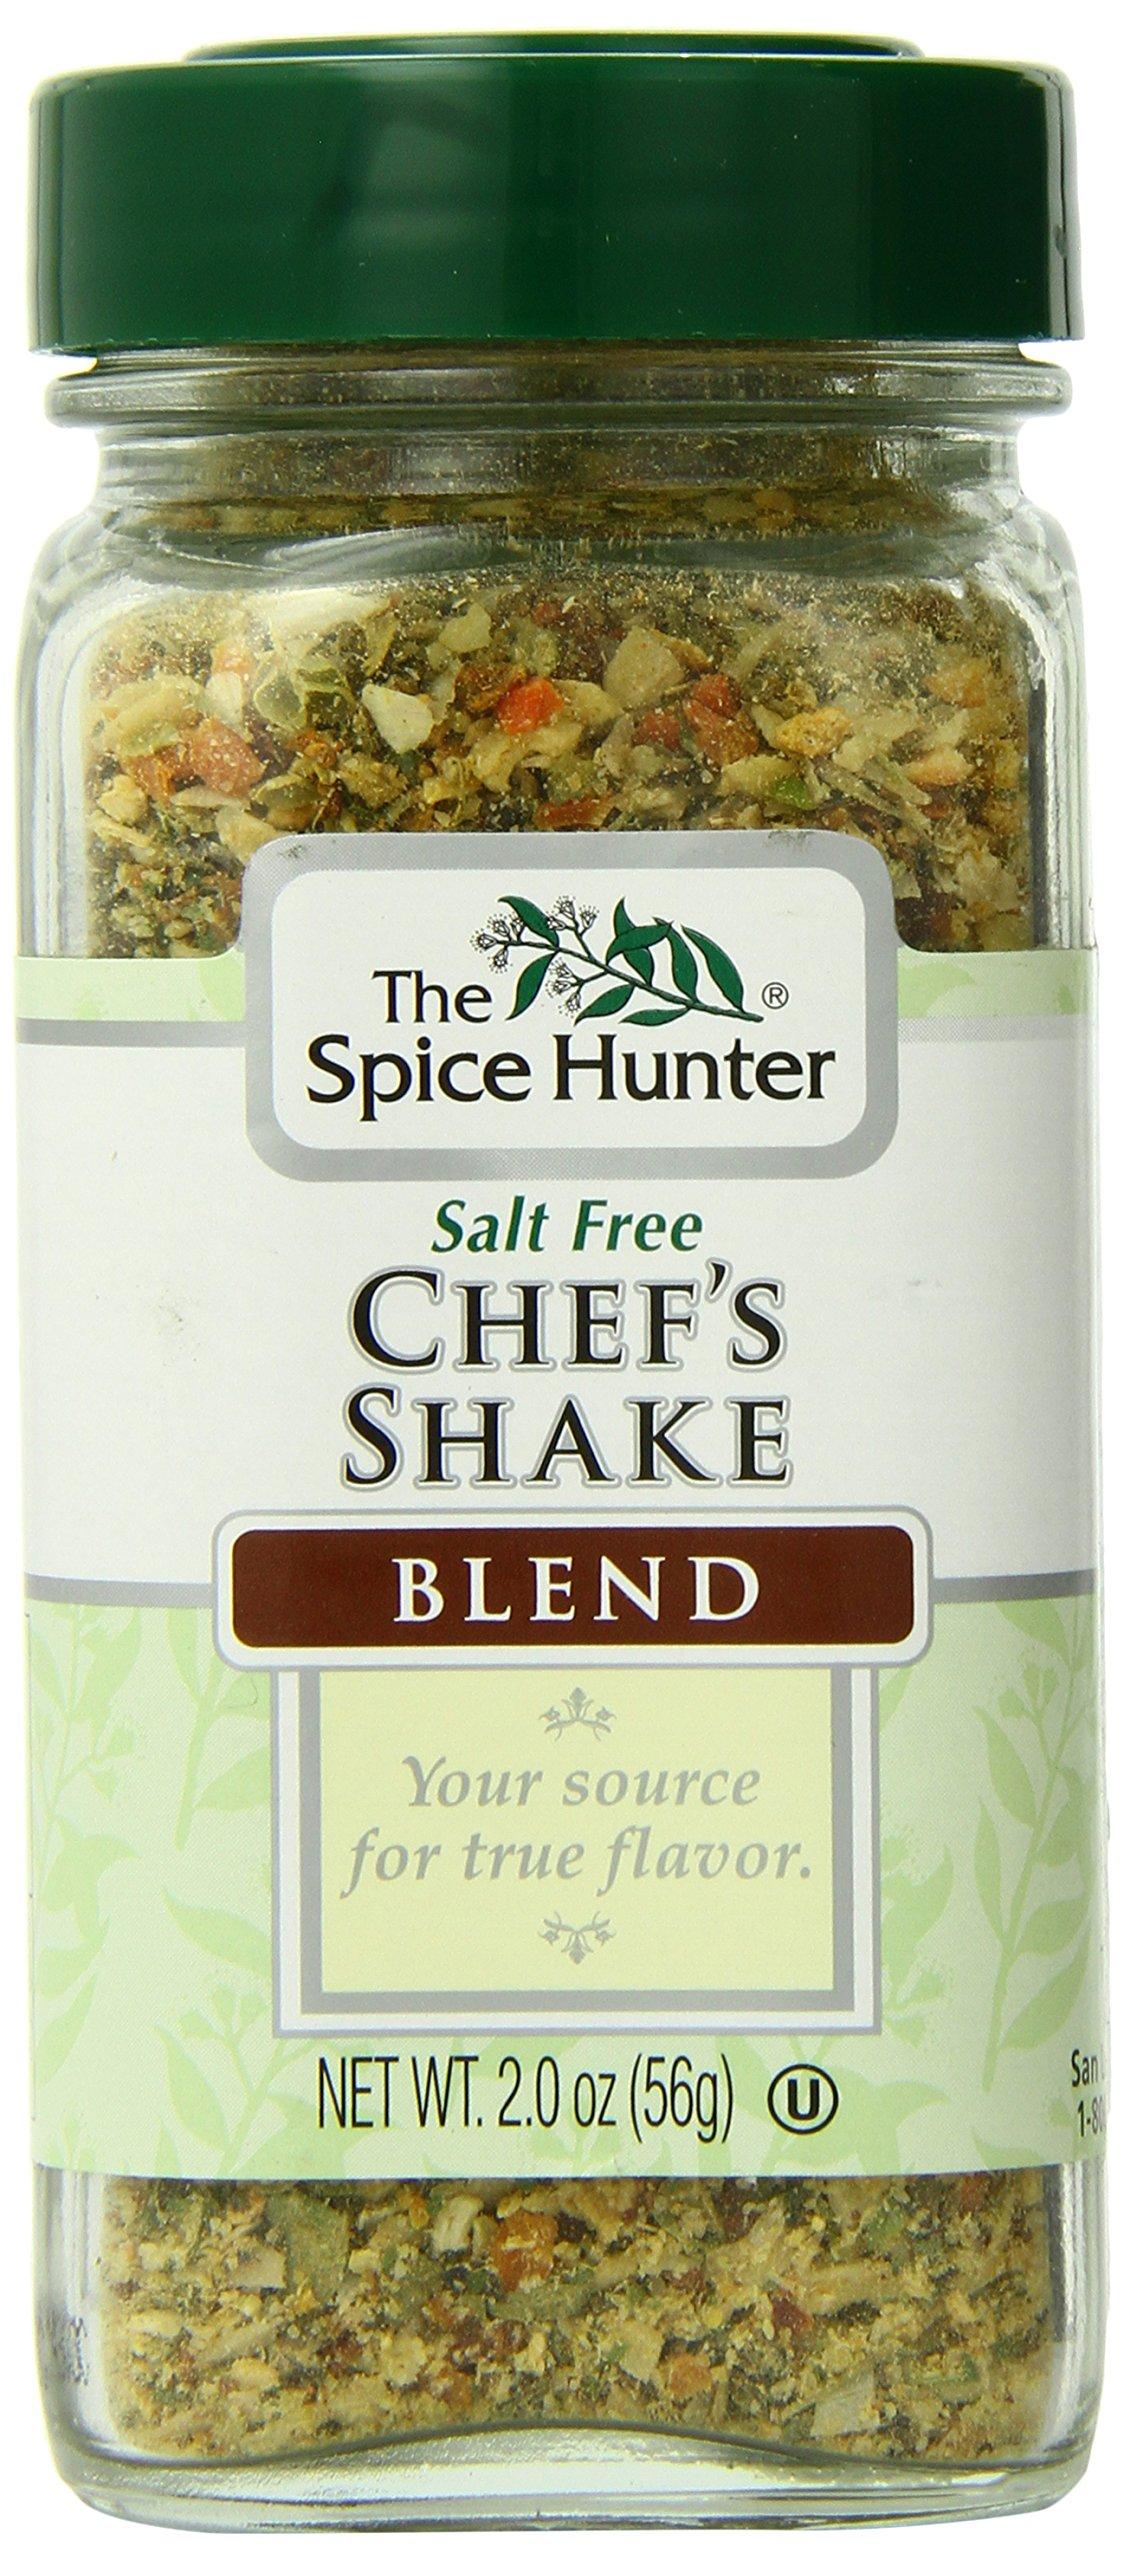 The Spice Hunter Salt Free Chefs Shake Blend, 2-Ounce Jar